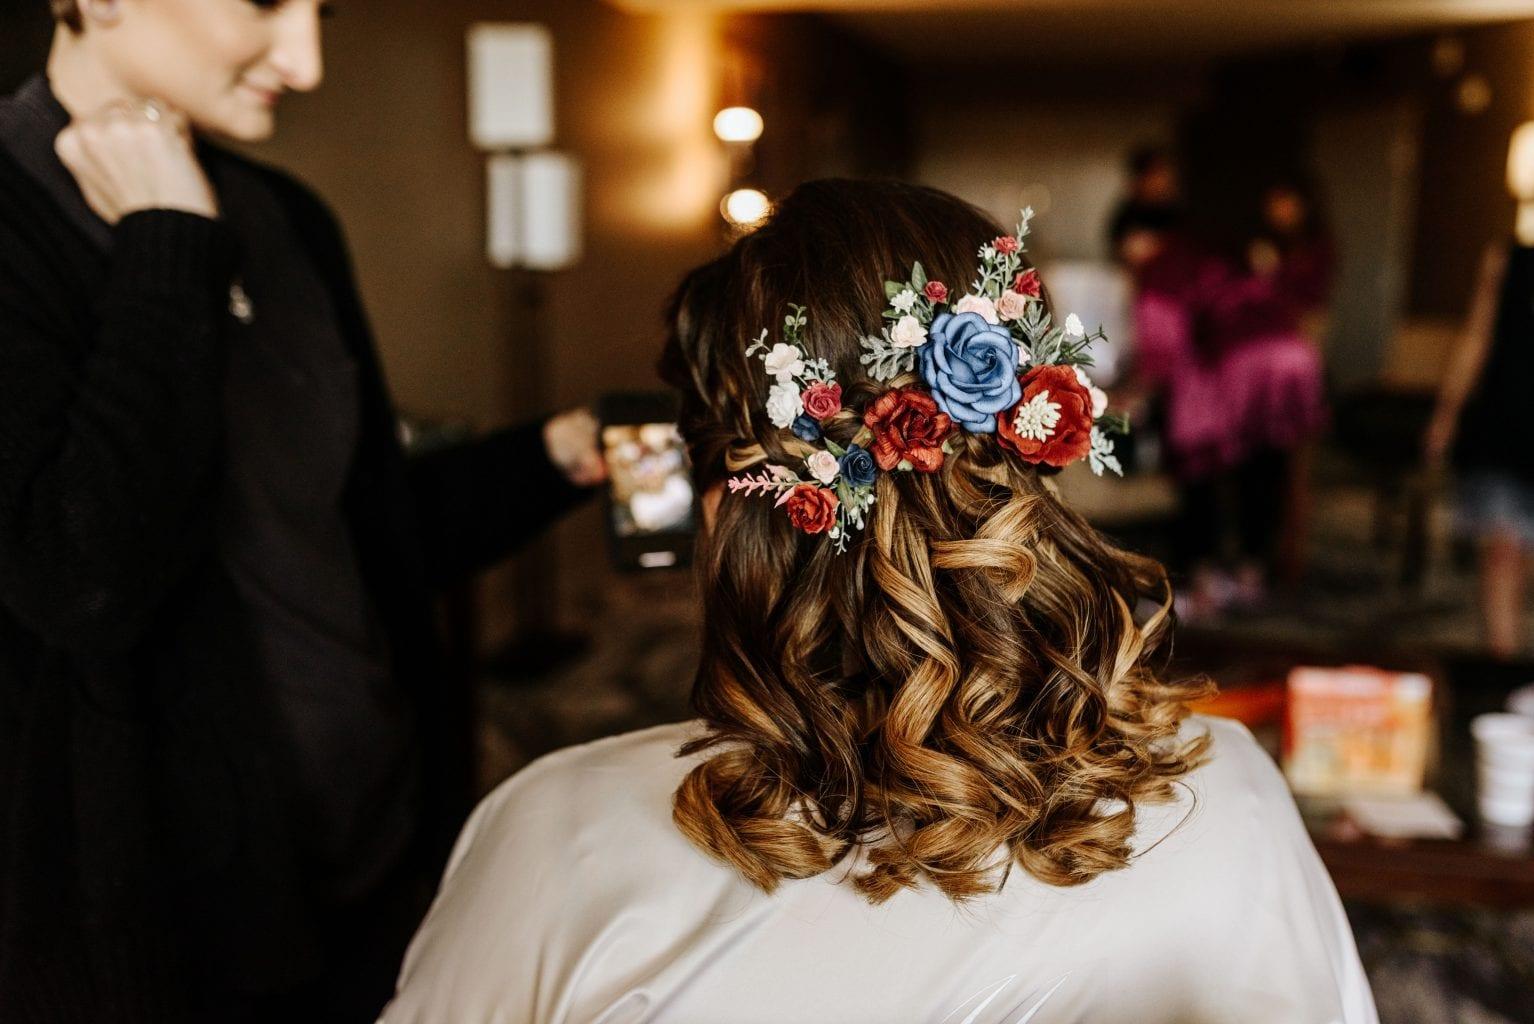 Short hair wedding hairstyle